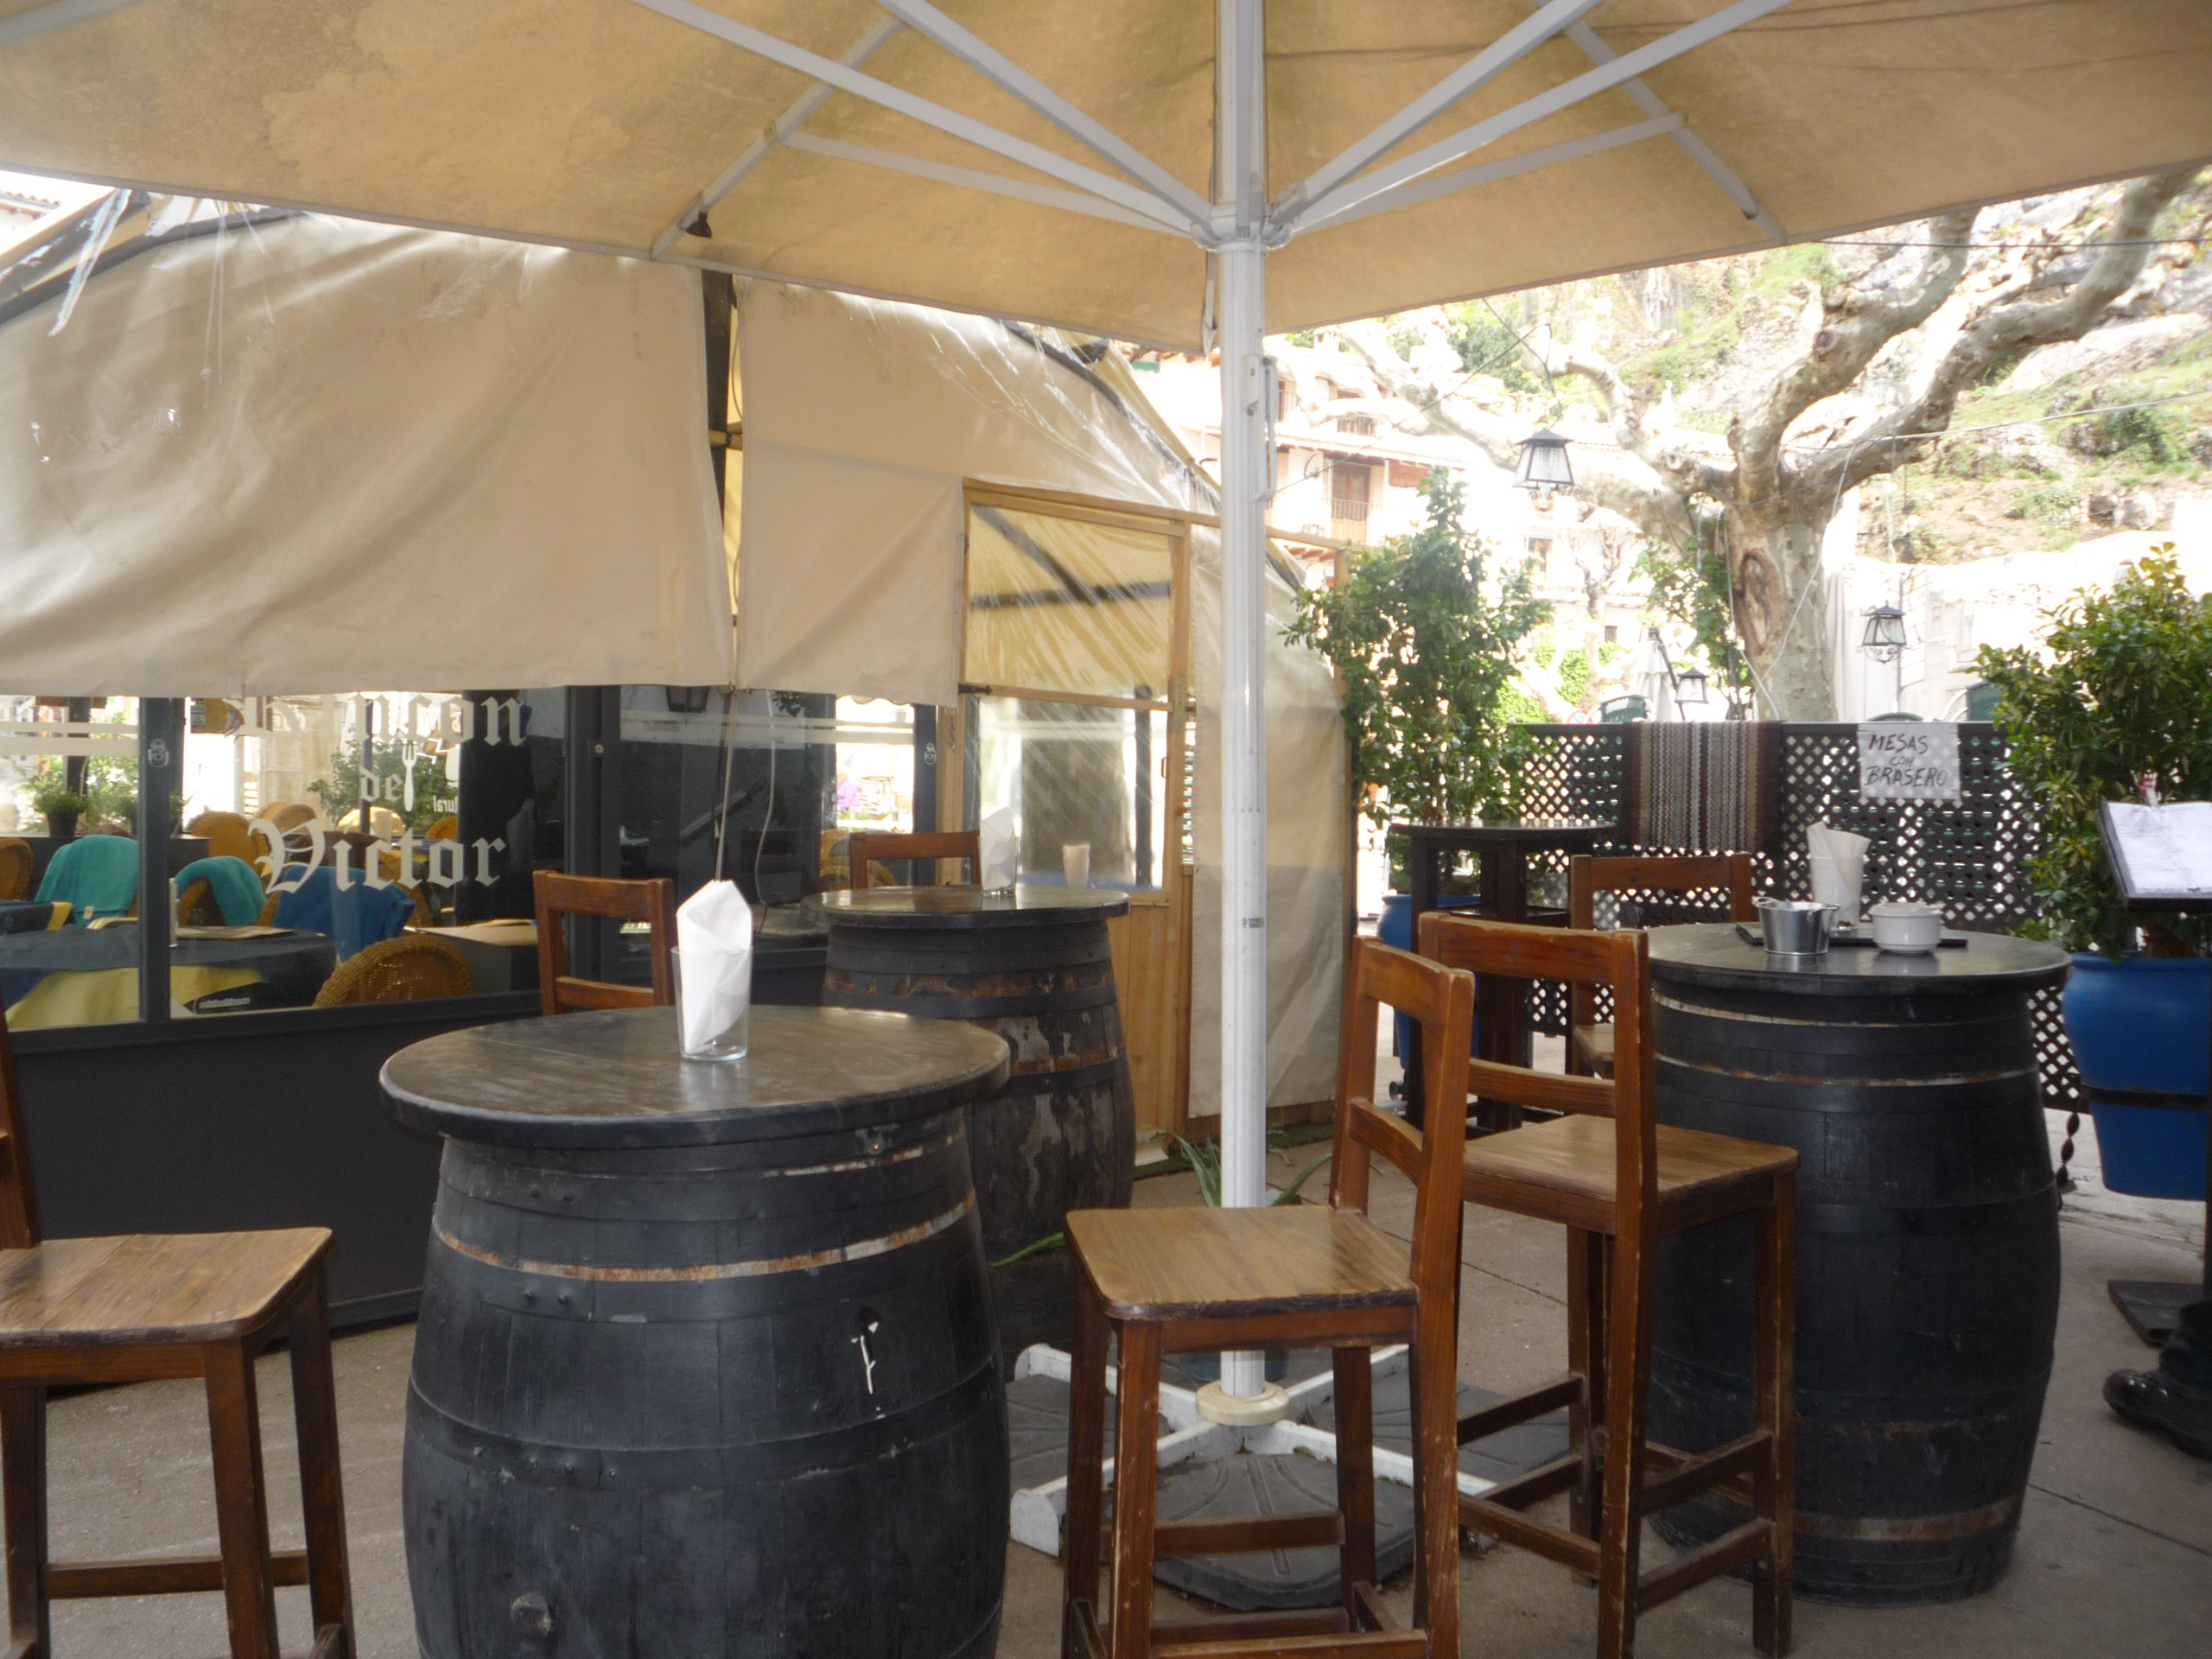 Bar-restaurante | Ref.313 | 700 €/mes | Inmobiliaria Morcillo